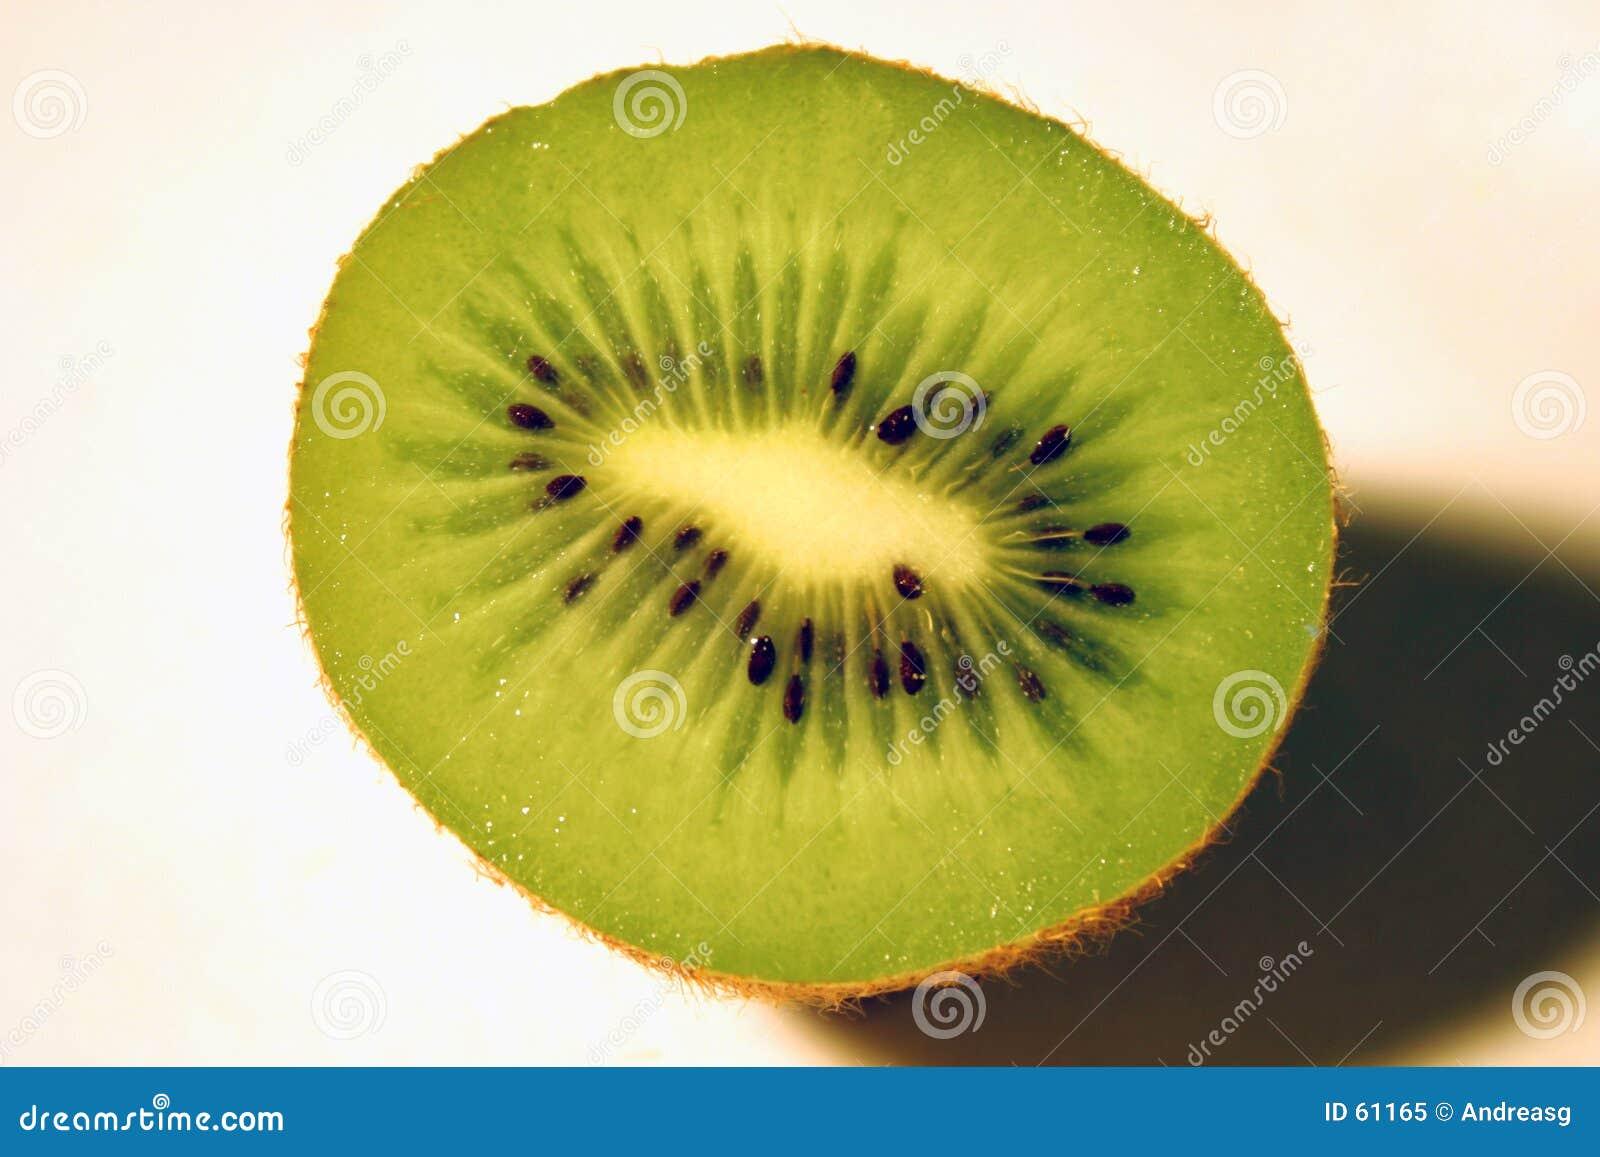 Halve kiwi